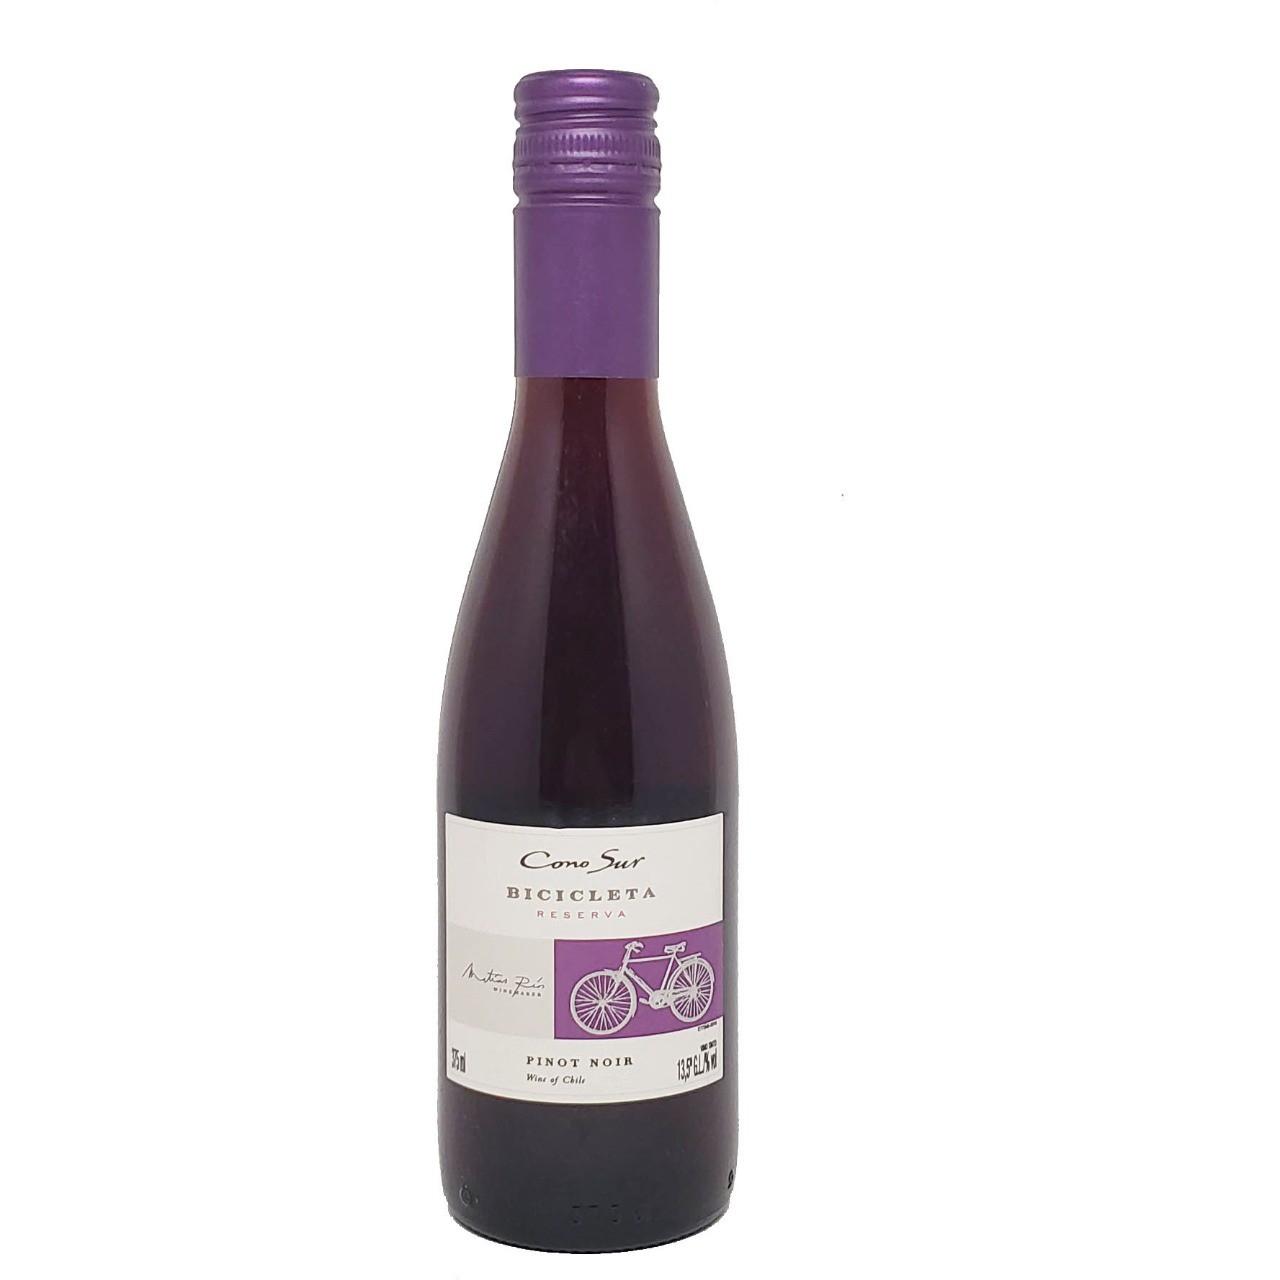 Vinho Tinto Bicicleta Reserva Pinot Noir Cono Sur - 375ml -